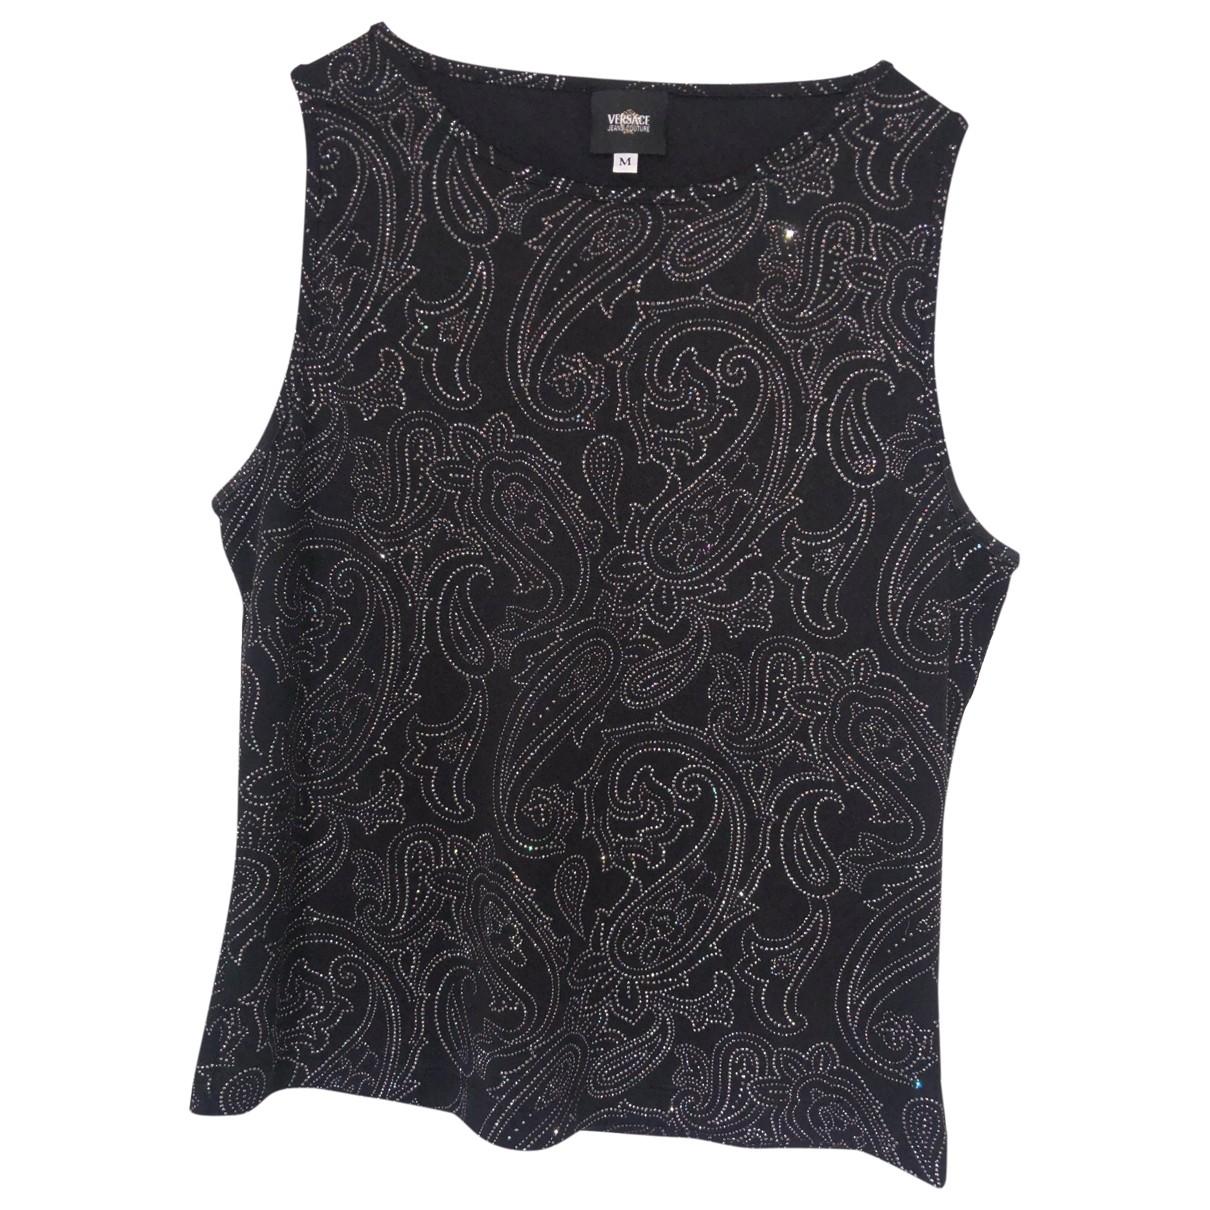 Versace Jeans \N Black  top for Women M International